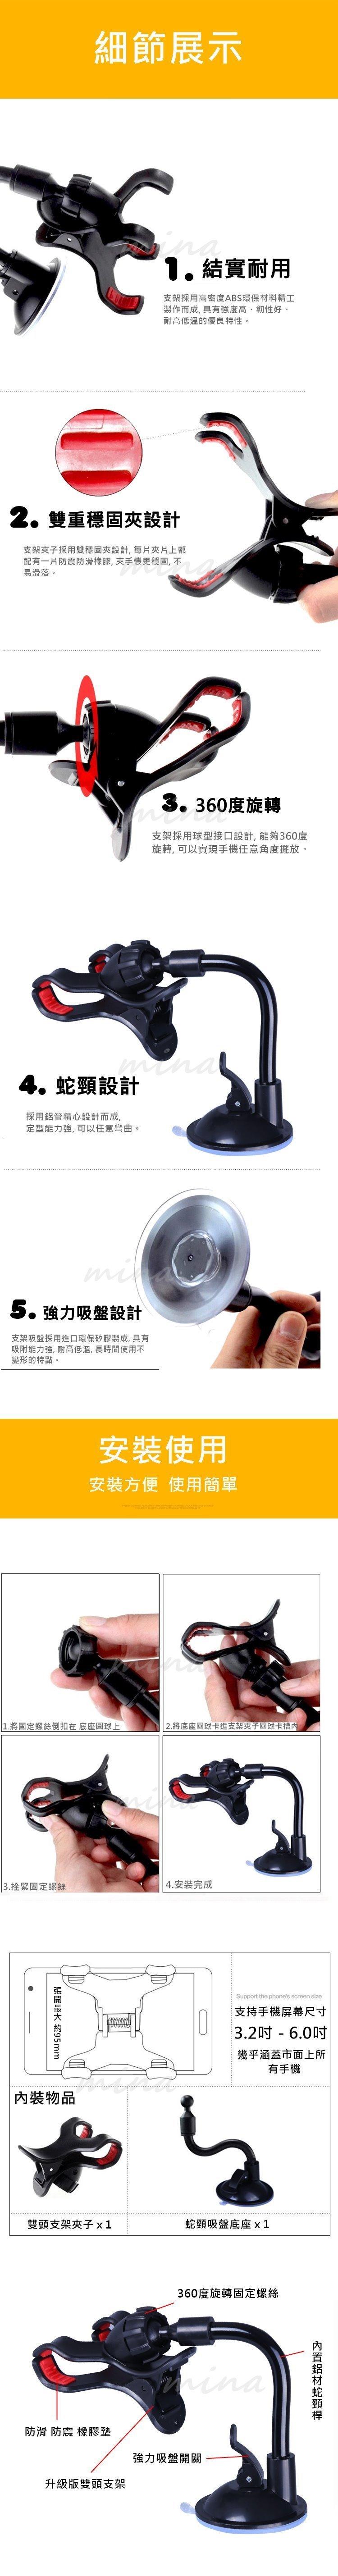 C0068 手機吸盤支架 首圖(有mina)